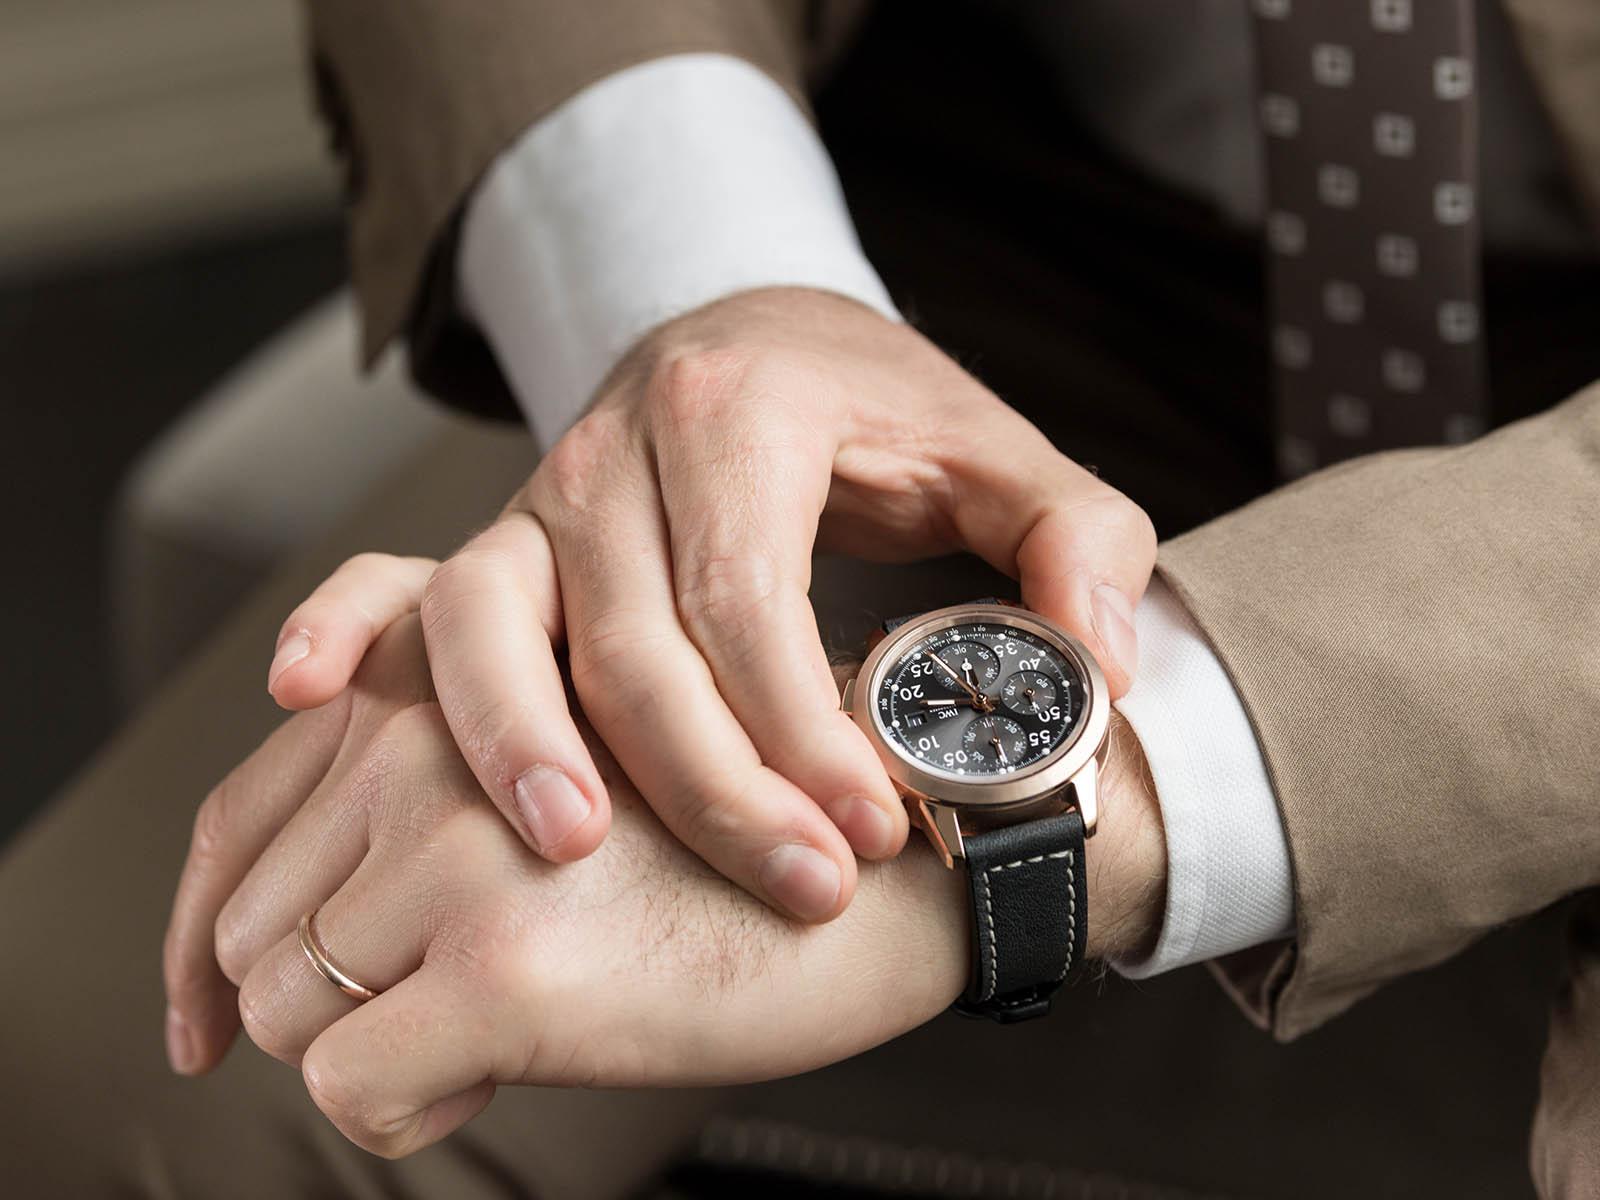 iwc-ingenieur-nico-rosberg-chronograph-2.jpg